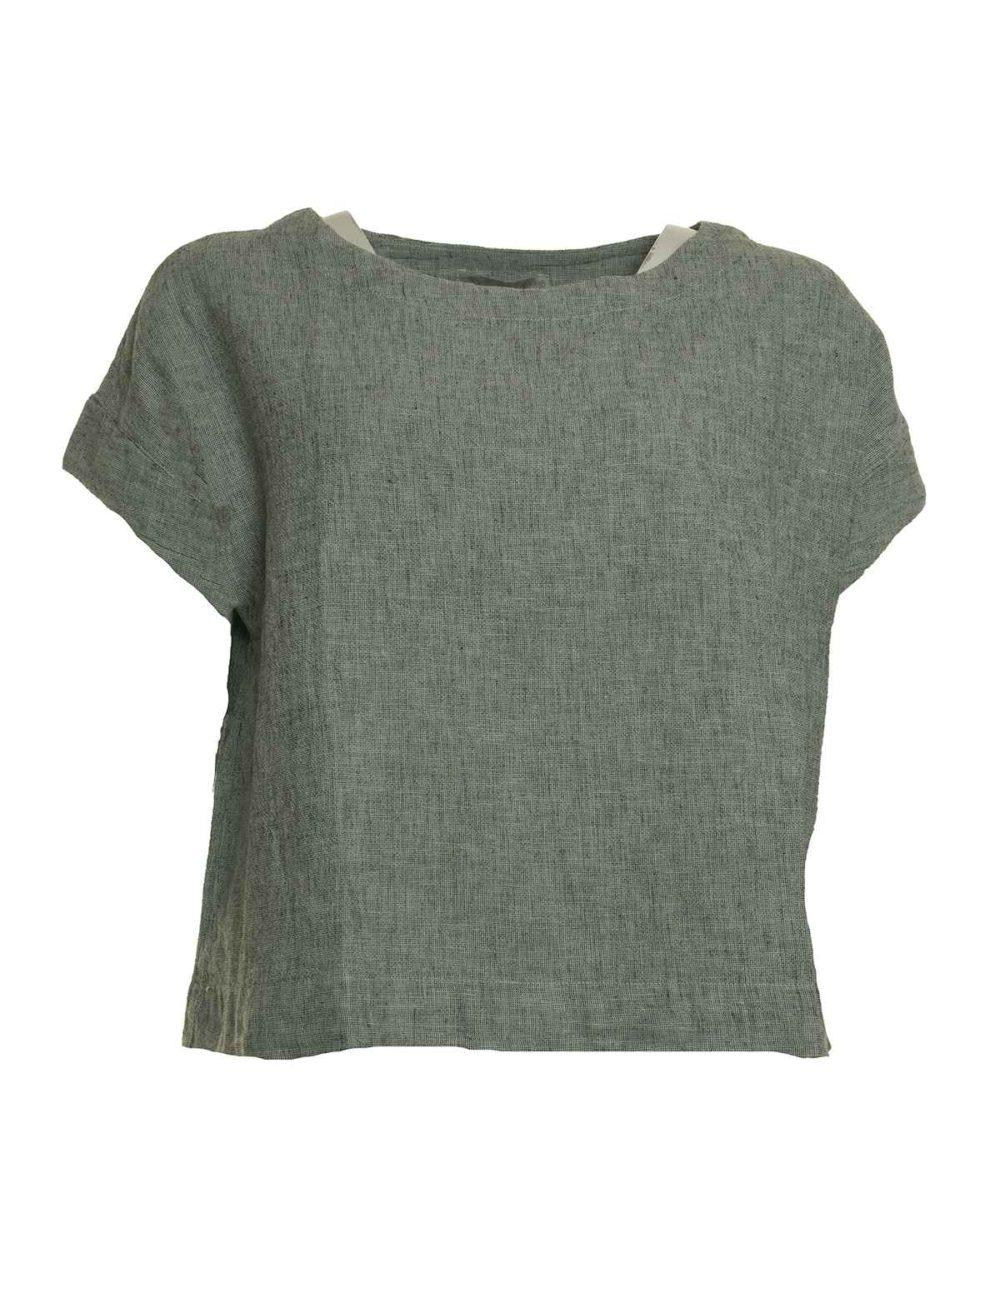 4196326 Crop Top Cut Loose Katie Kerr Women's Clothing